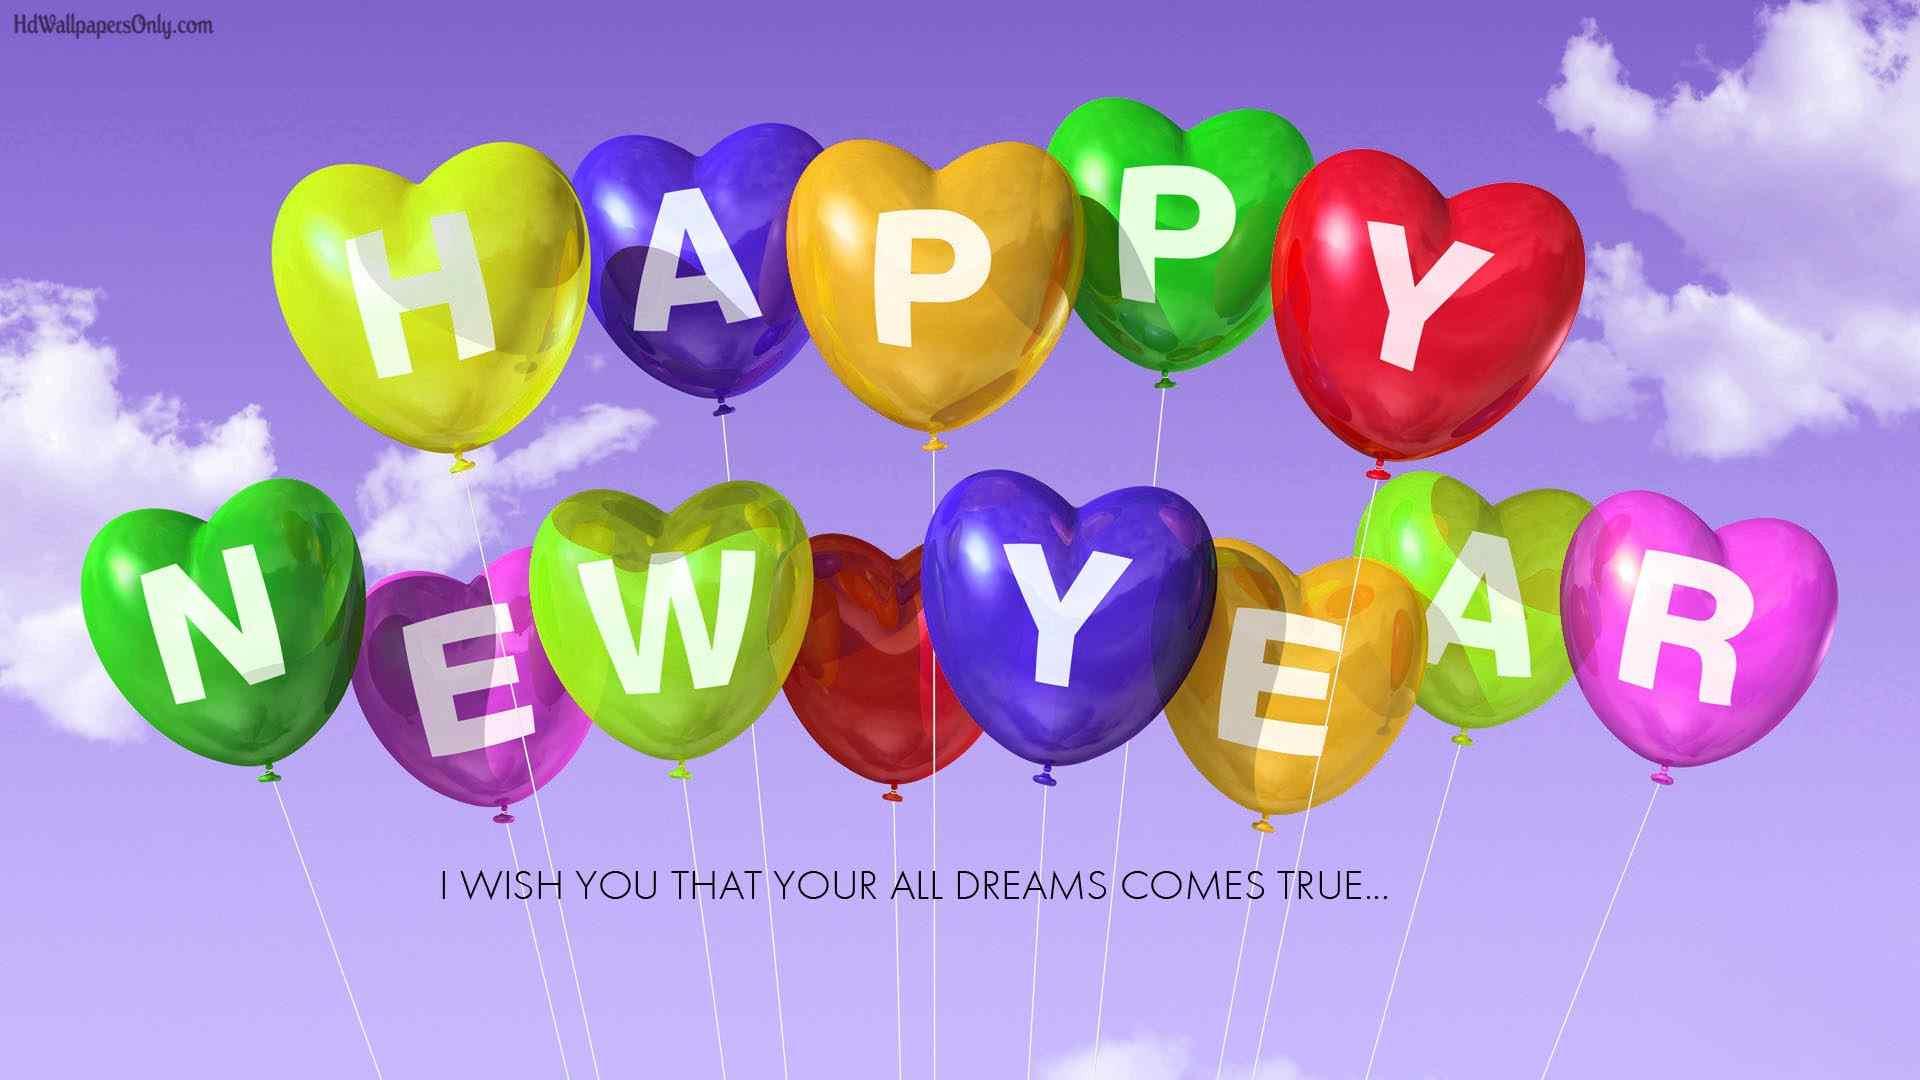 Happy New Year My Friends!